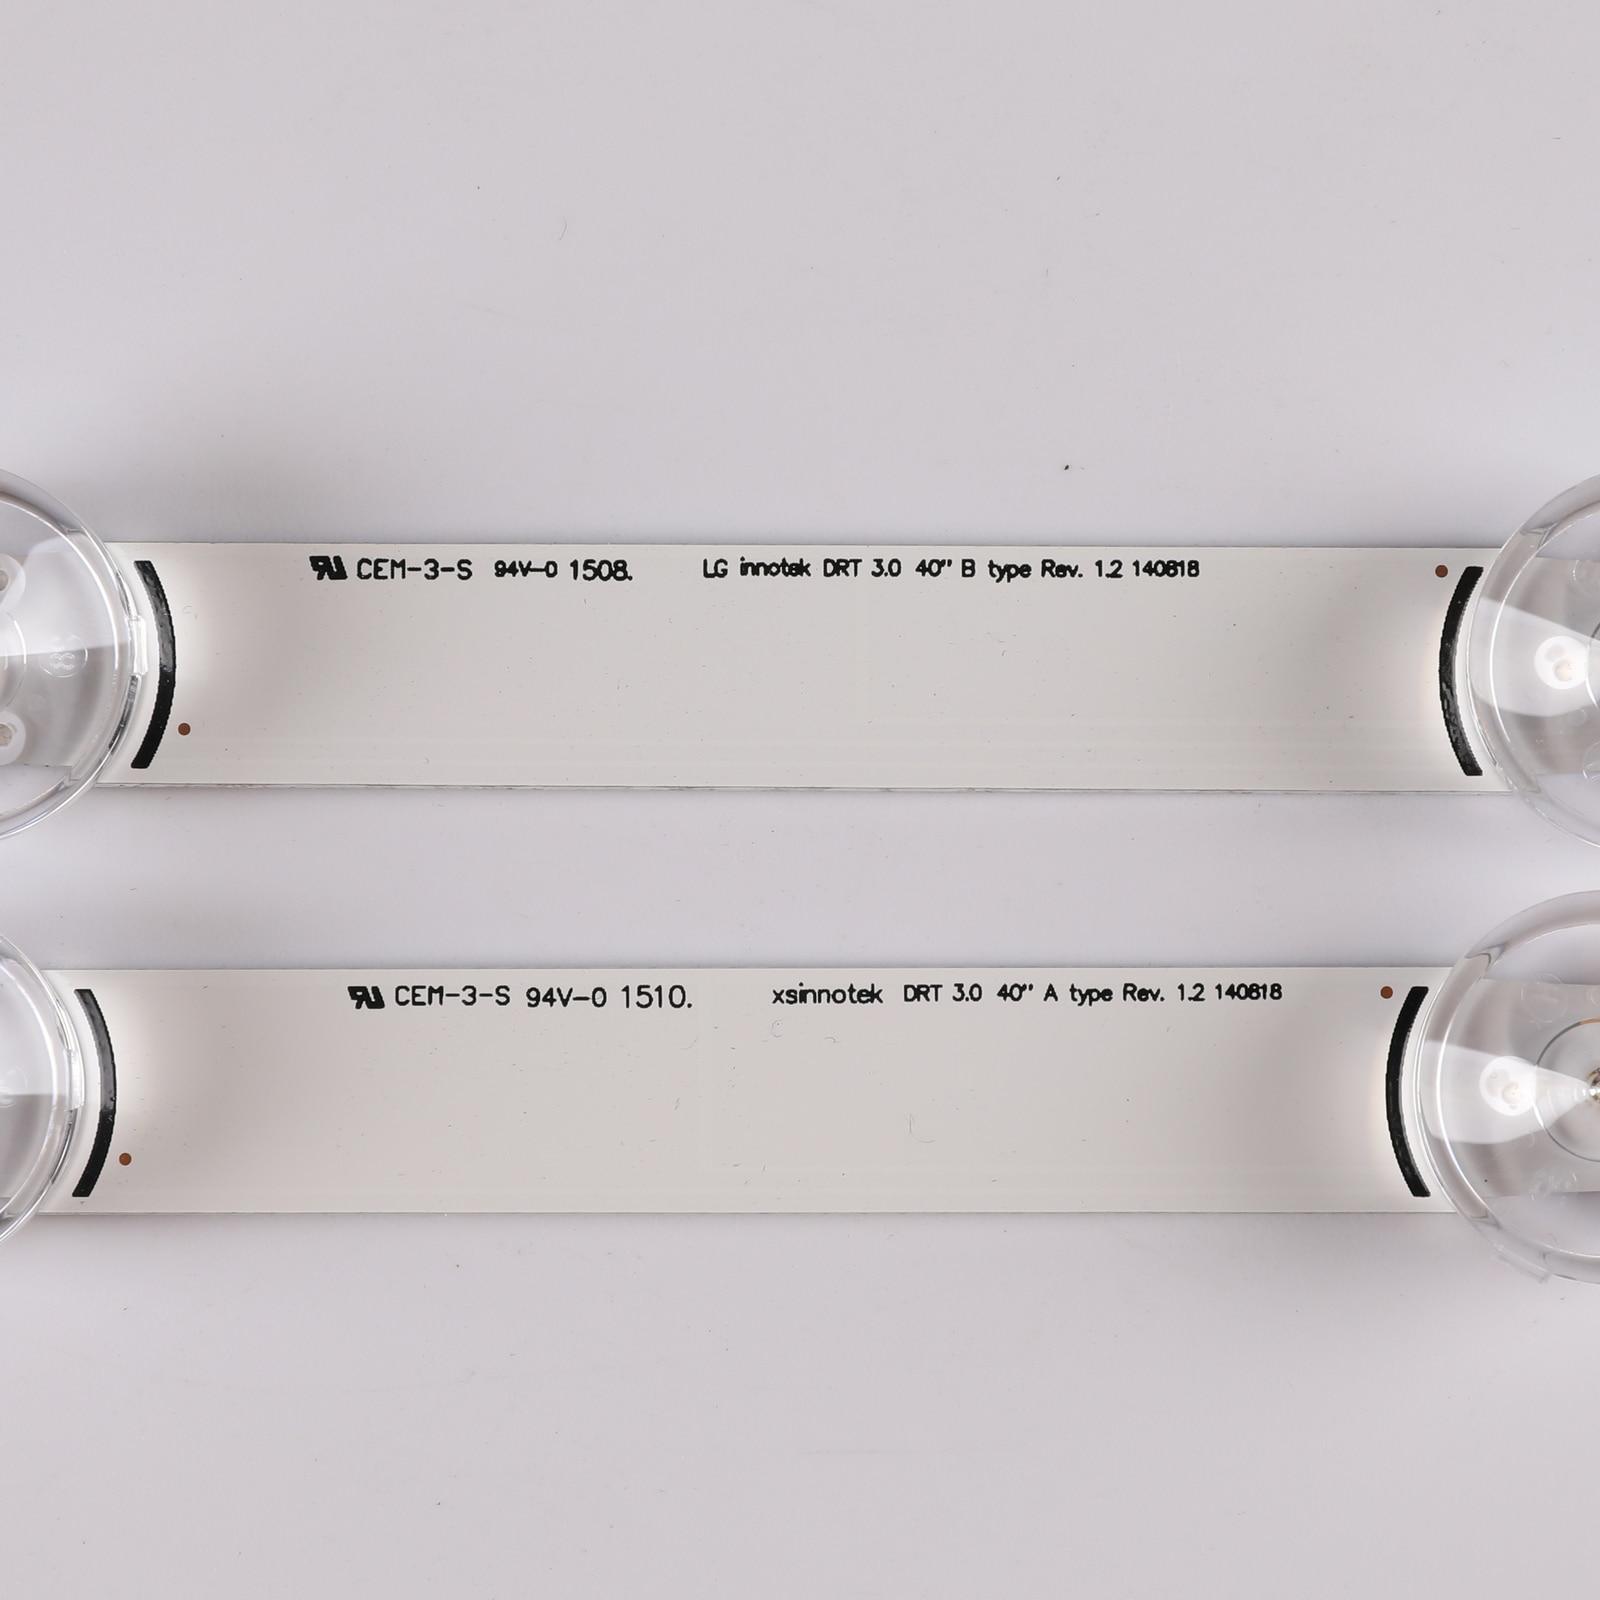 New Kit 8 PCS LED Backlight strip For LG 40LF630V 40LF570V INNOTEK 40 DRT4.0 DRT 4.0 3.0 40 inch A B SVL400  6916L-0885A 0884A enlarge